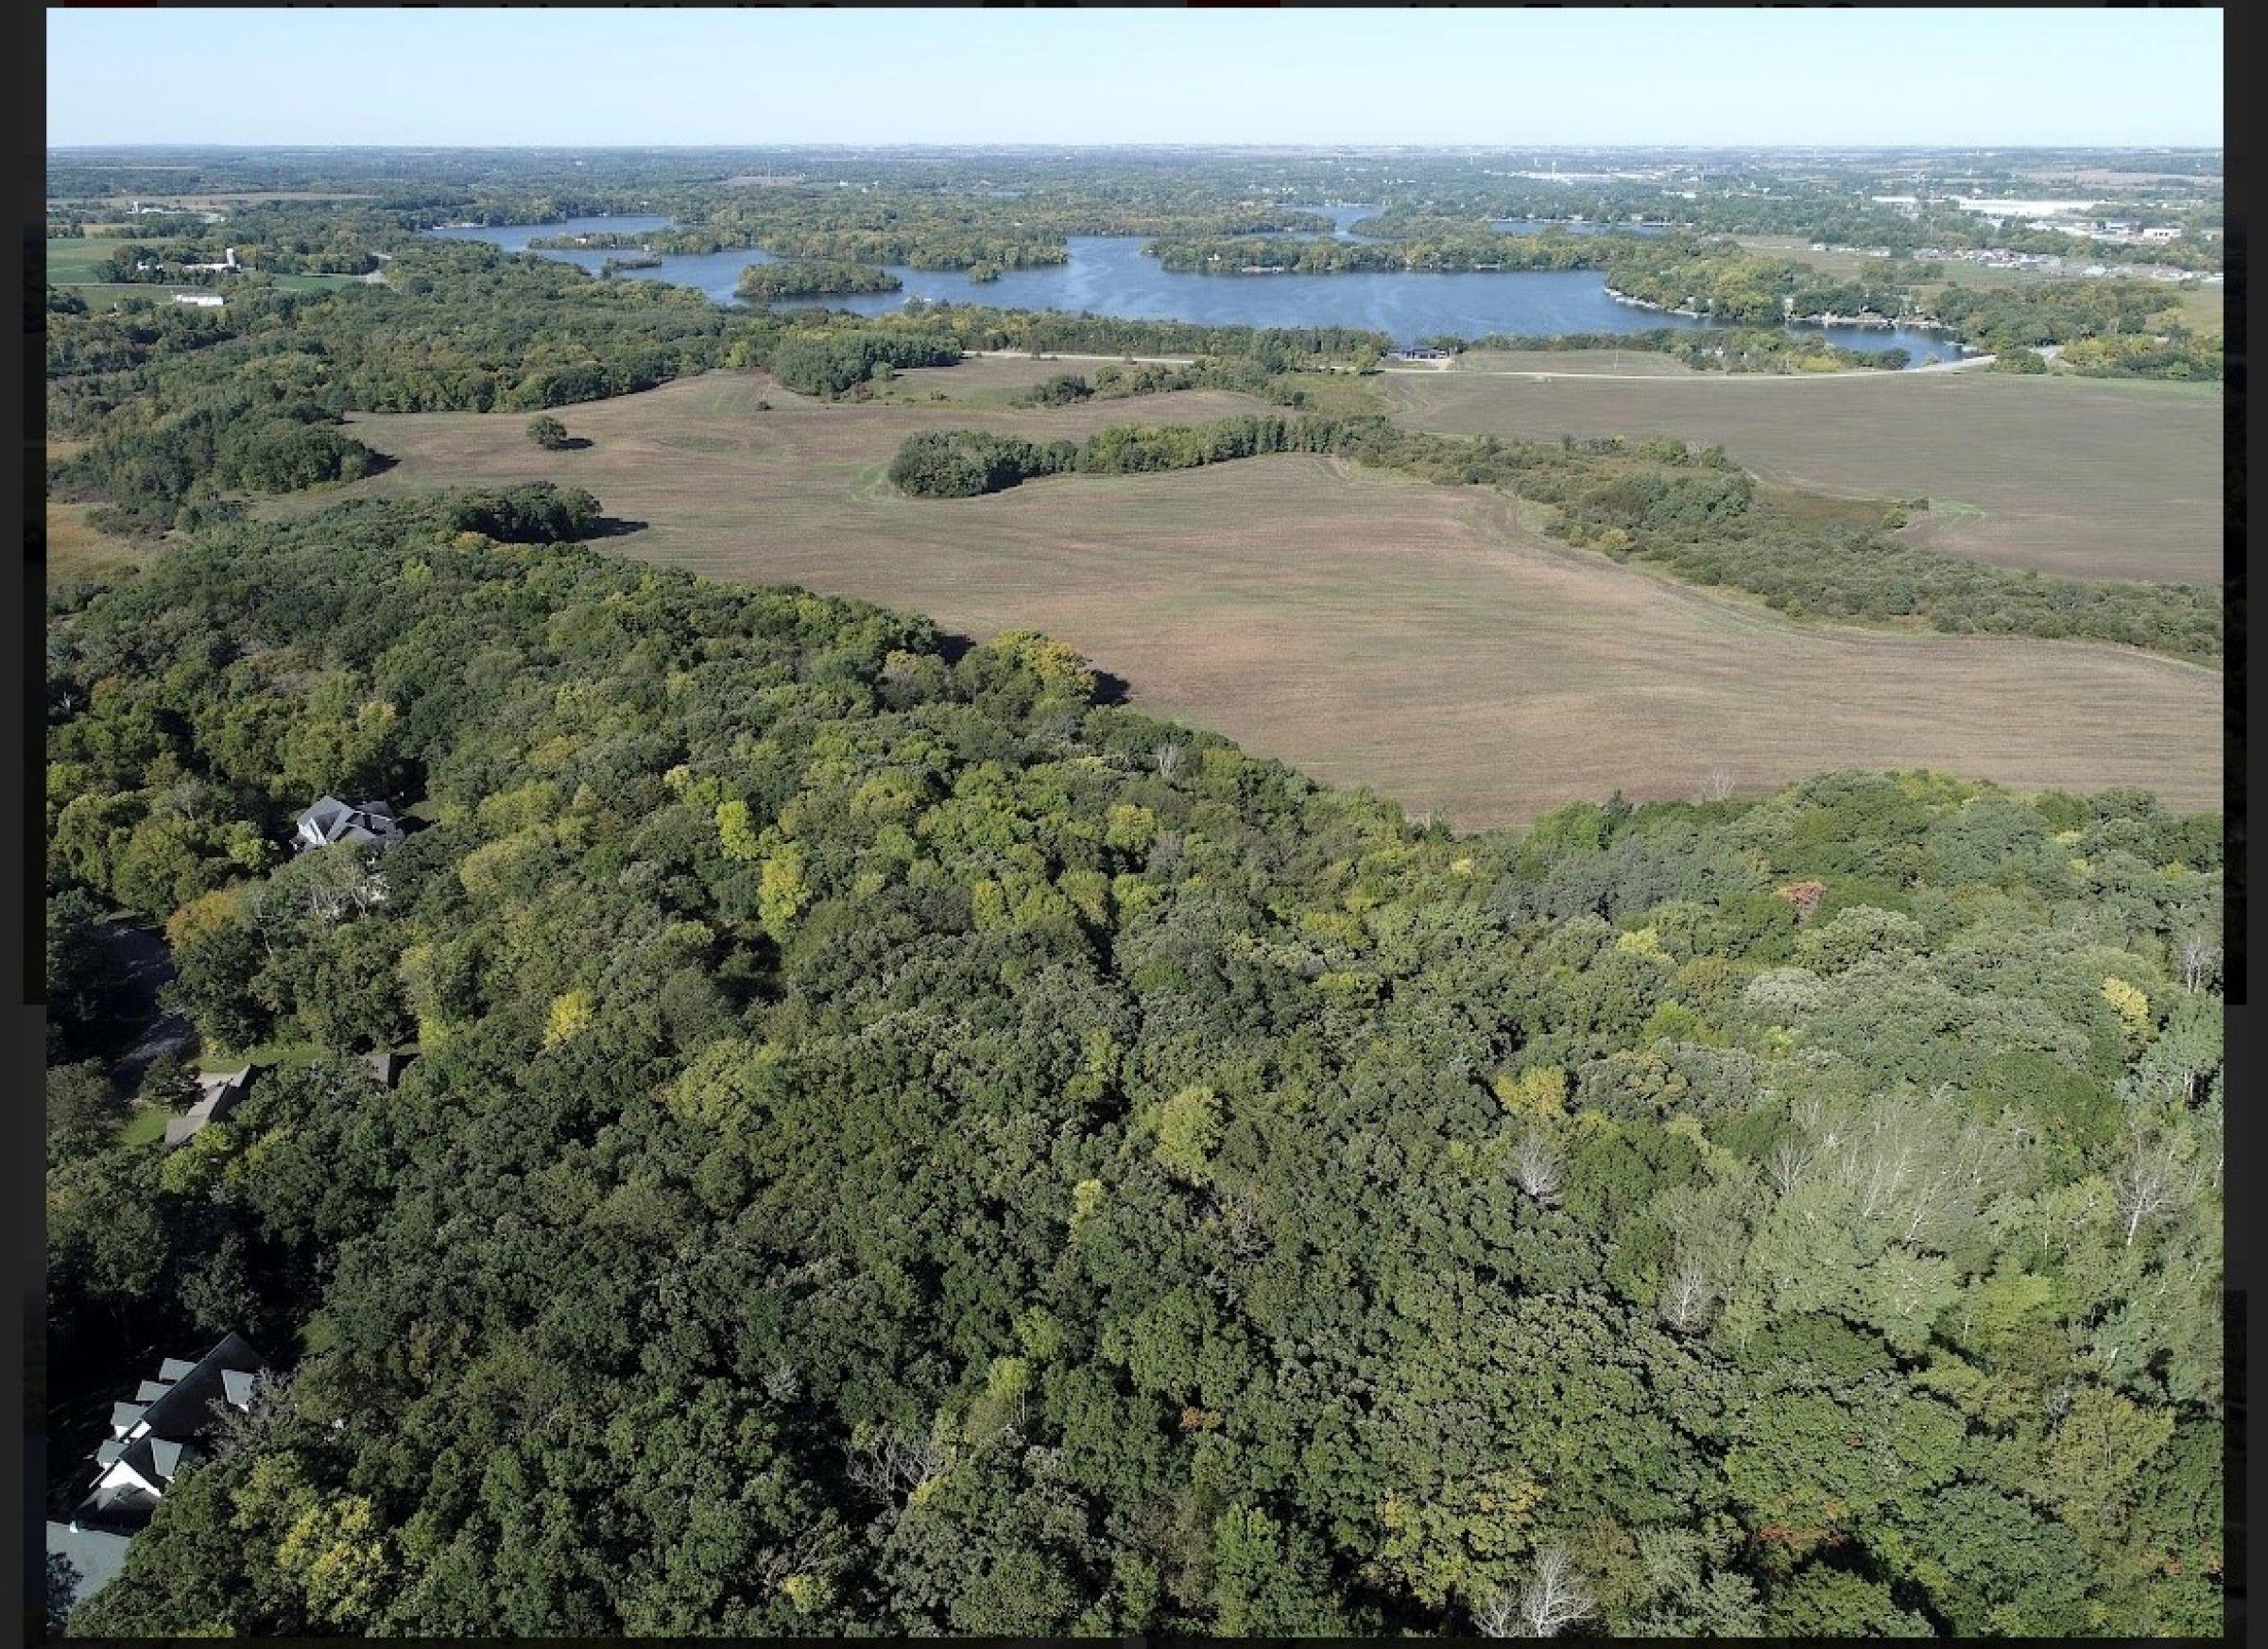 land-stearns-county-minnesota-298-acres-listing-number-15712-0-2021-09-23-123544.jpg